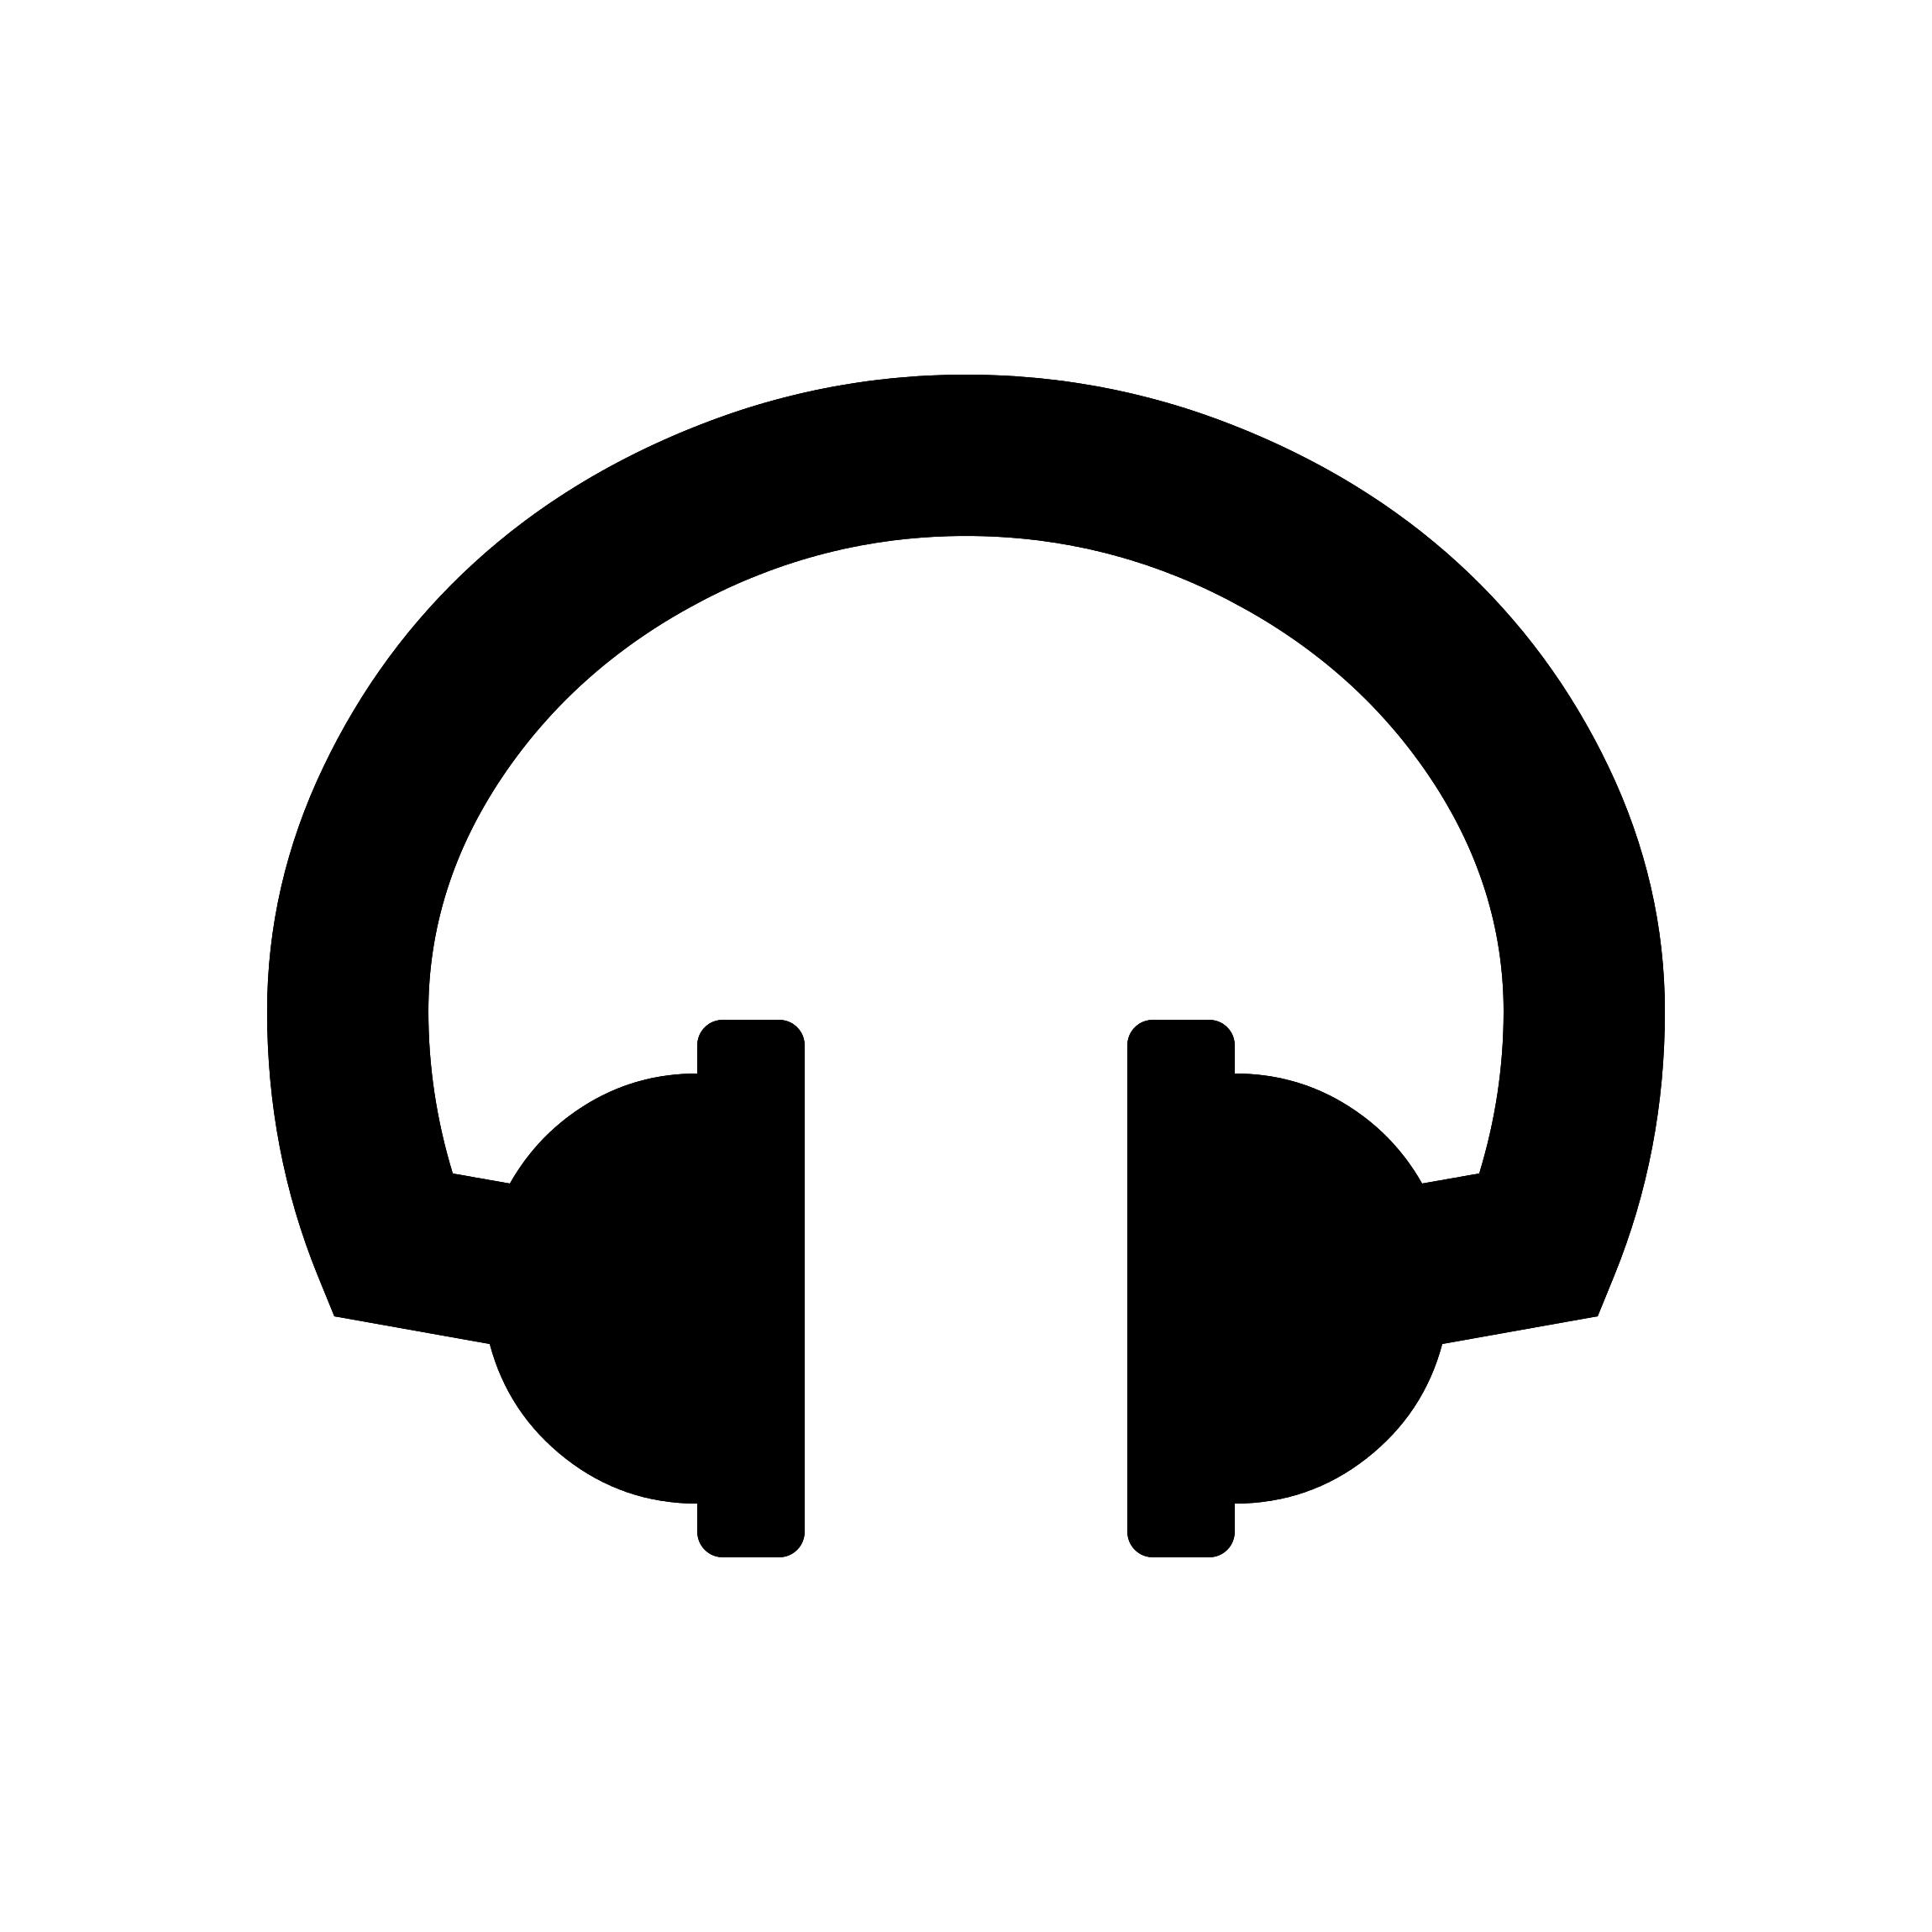 data/images/headphones.png